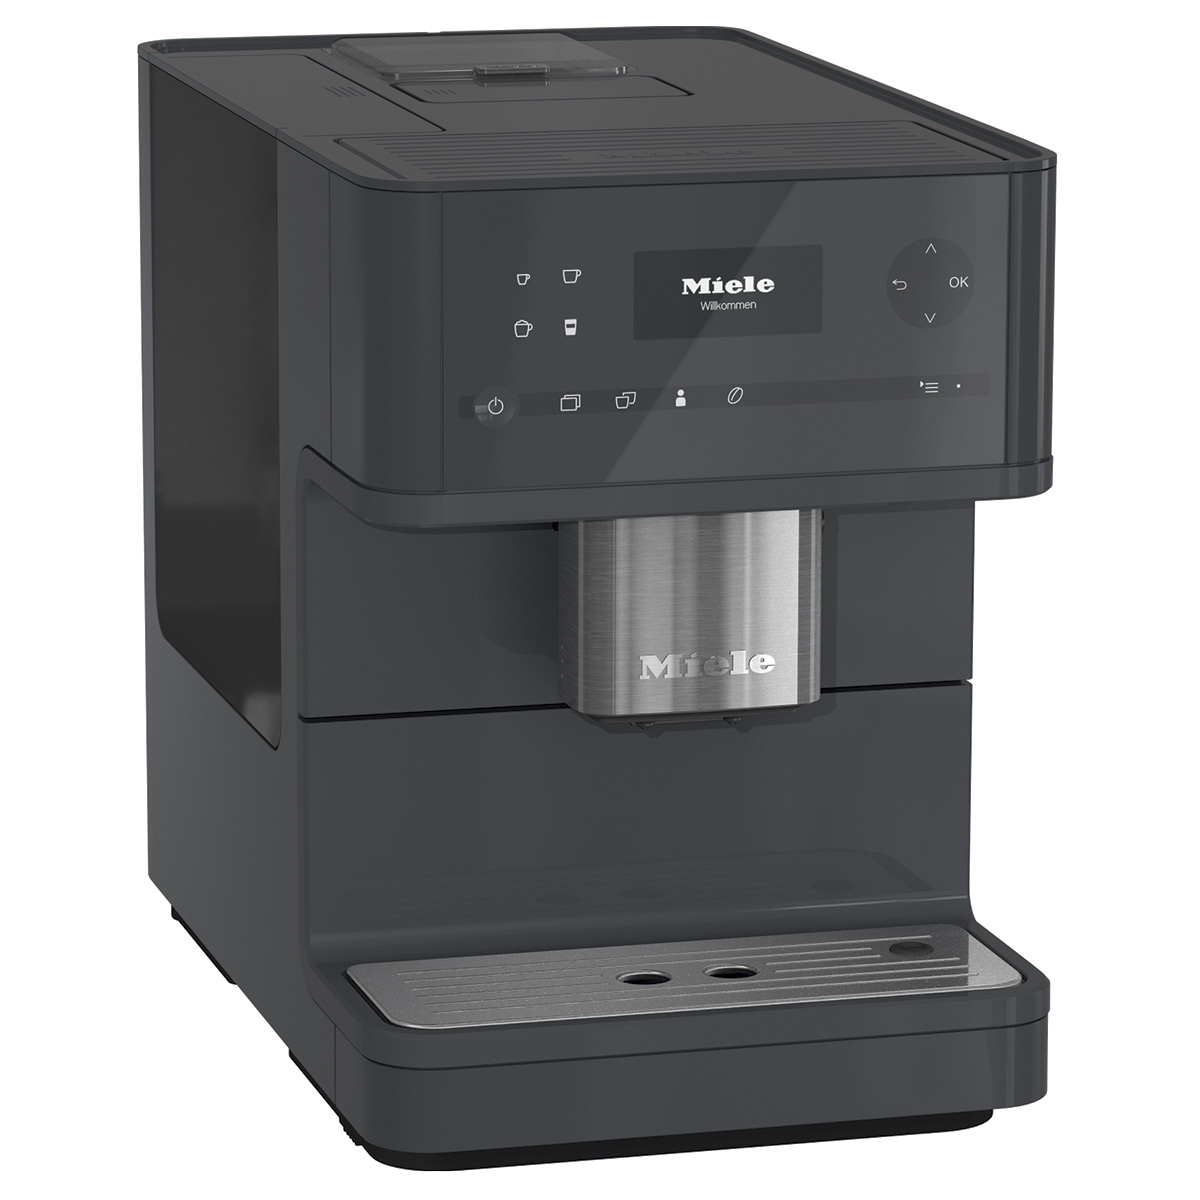 Image of   Miele espressomaskine - CM 6150 - Graphite grey